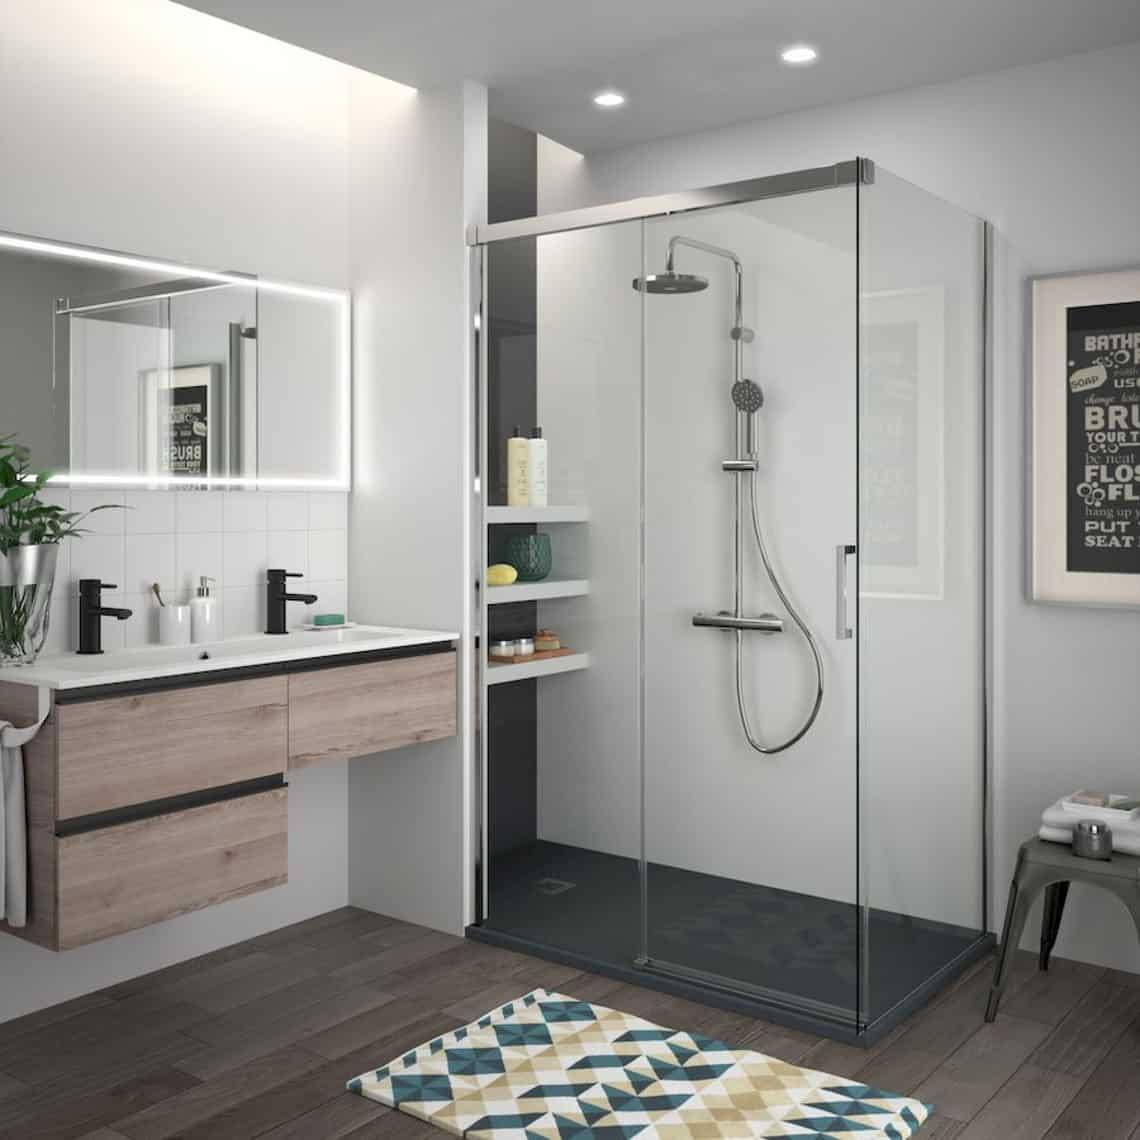 Cuarto de baño con mampara Copenhague de Salgar | Banium.com